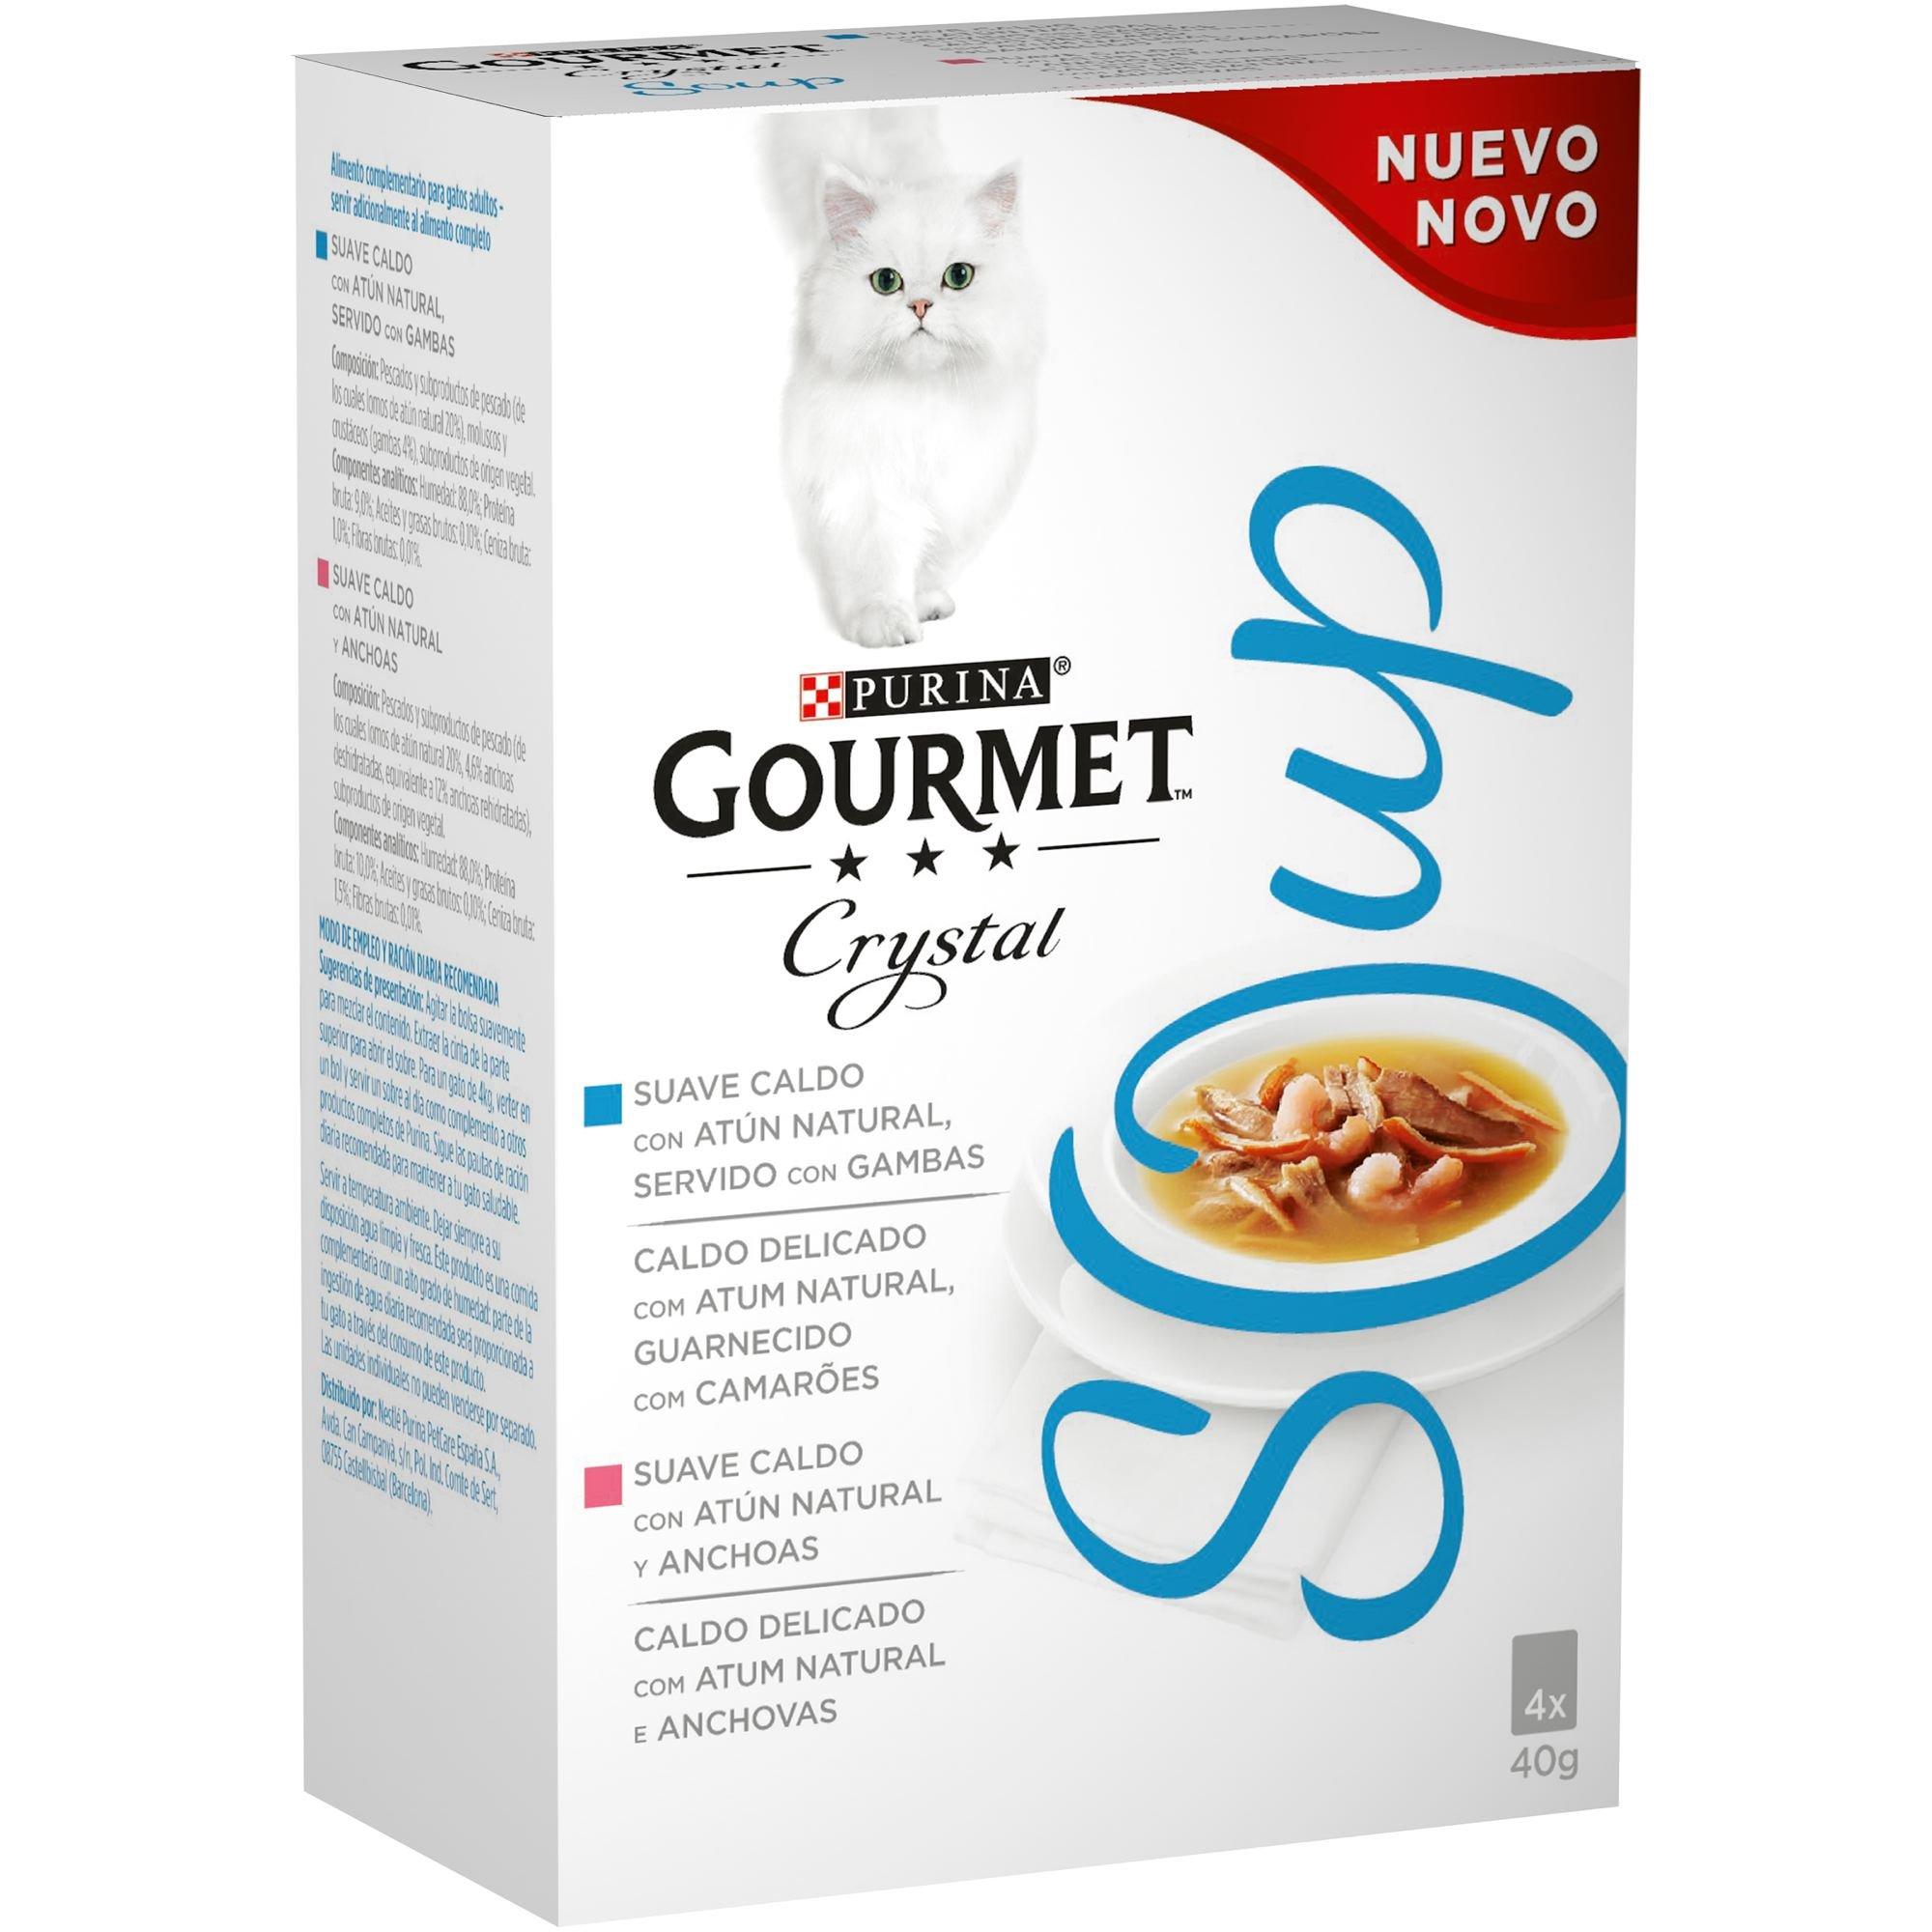 Purina Gourmet Crystal Soup comida para gatos con Atun Natural y Gambas 10 x [4 x 40 g]